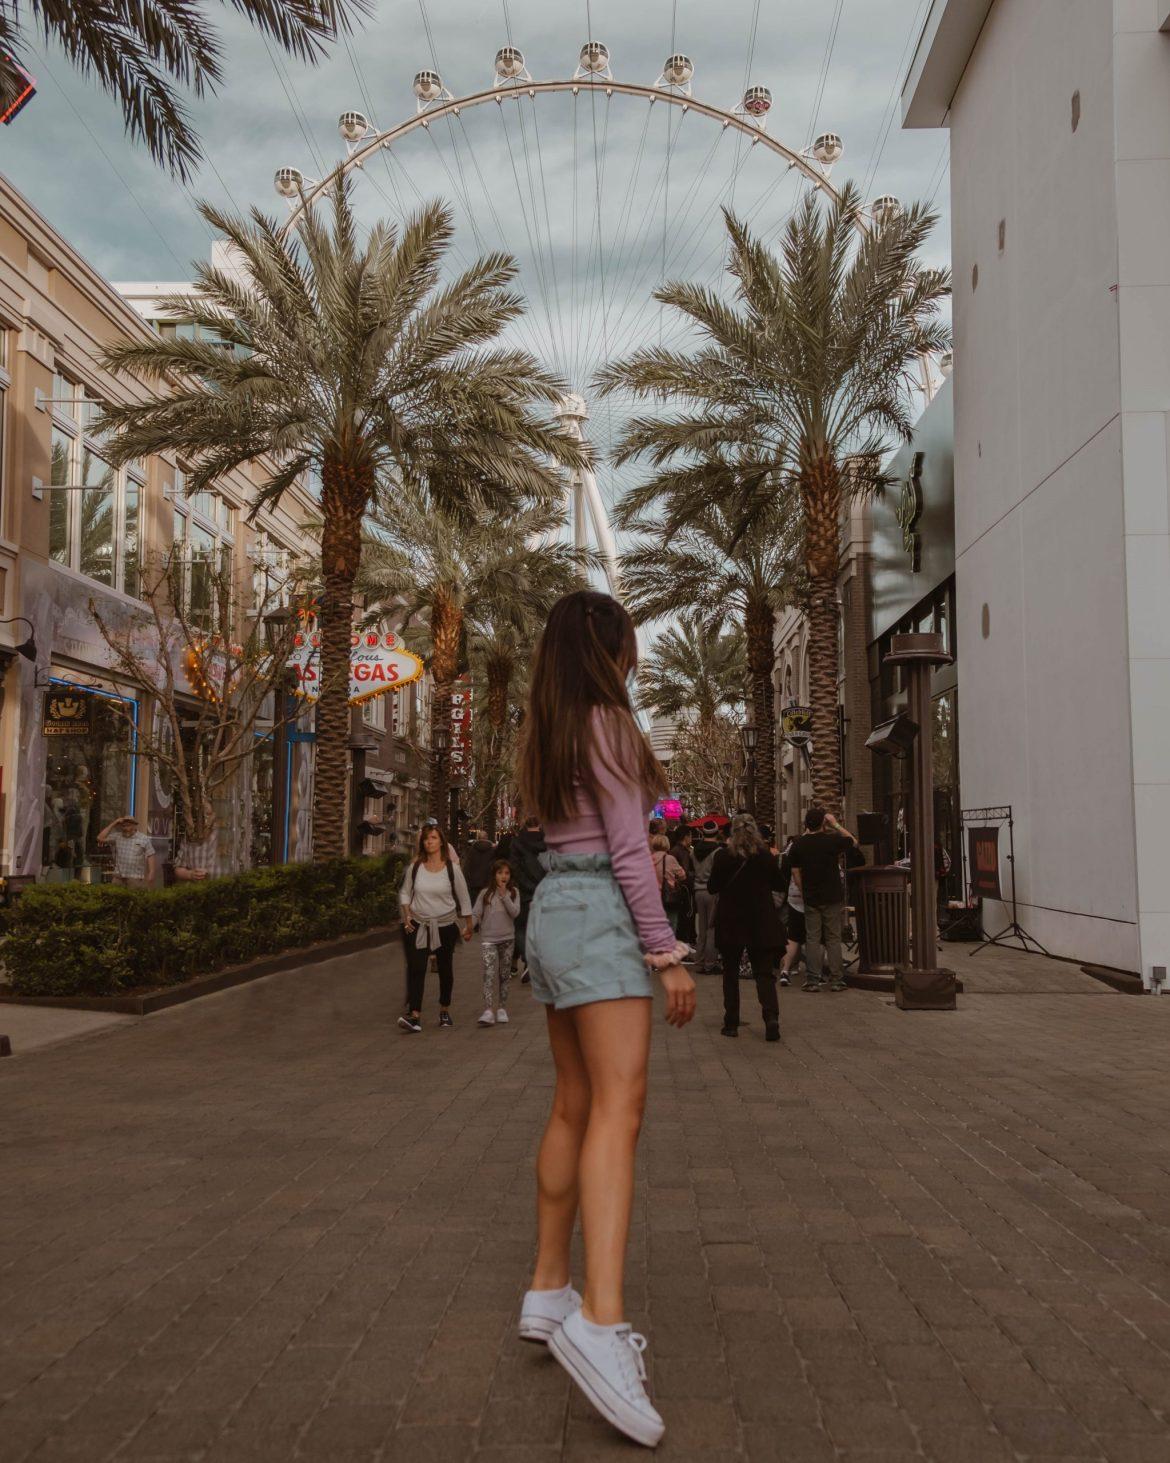 Ferris wheel in Las Vegas, cute Vegas outfit, travel destinations